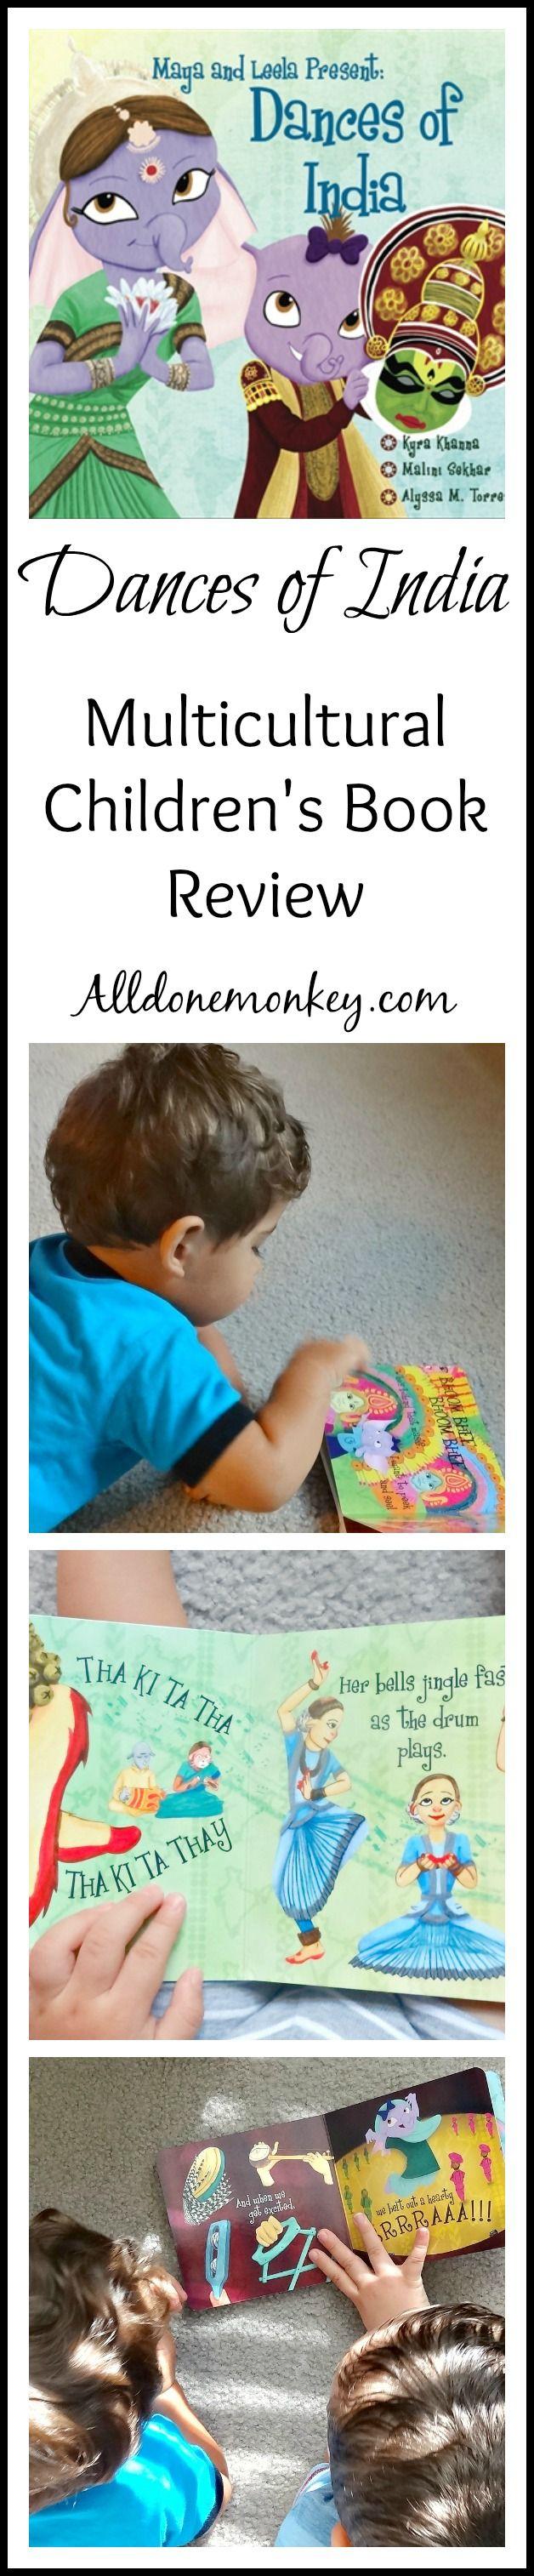 Dances of India Multicultural Children's Book Review | Alldonemonkey.com